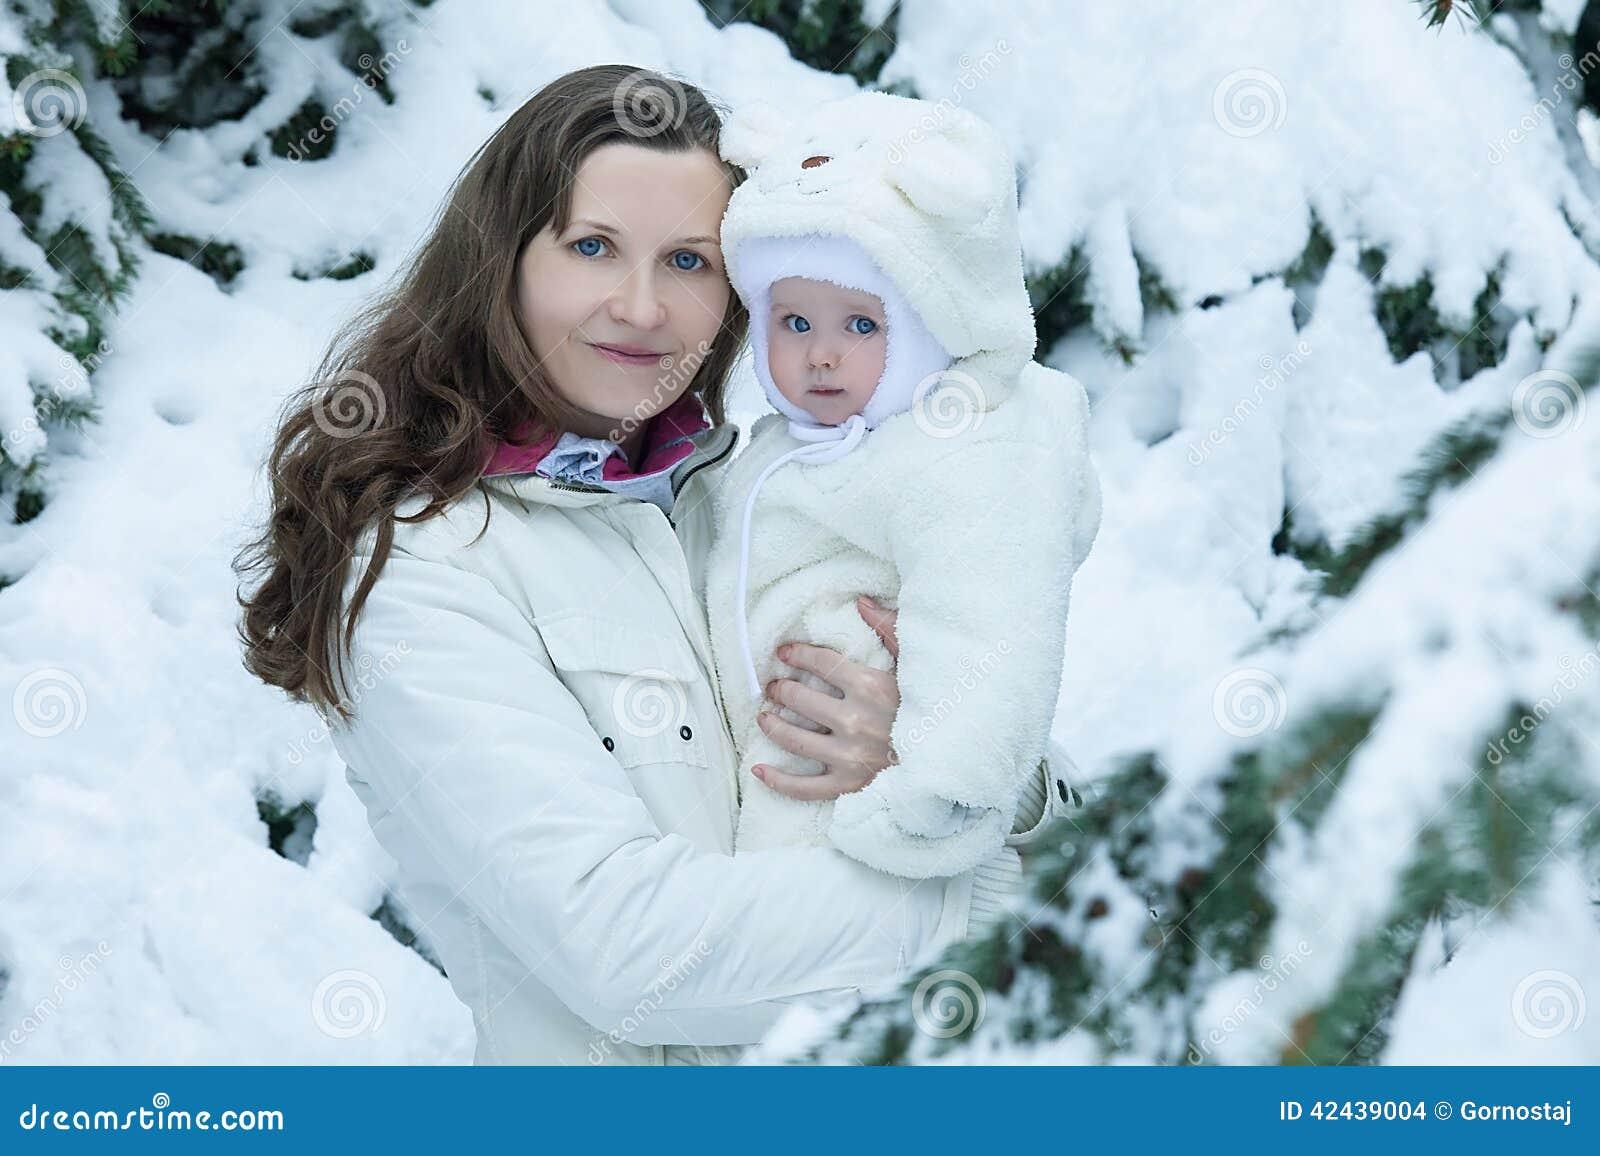 Madre morena joven con su hija